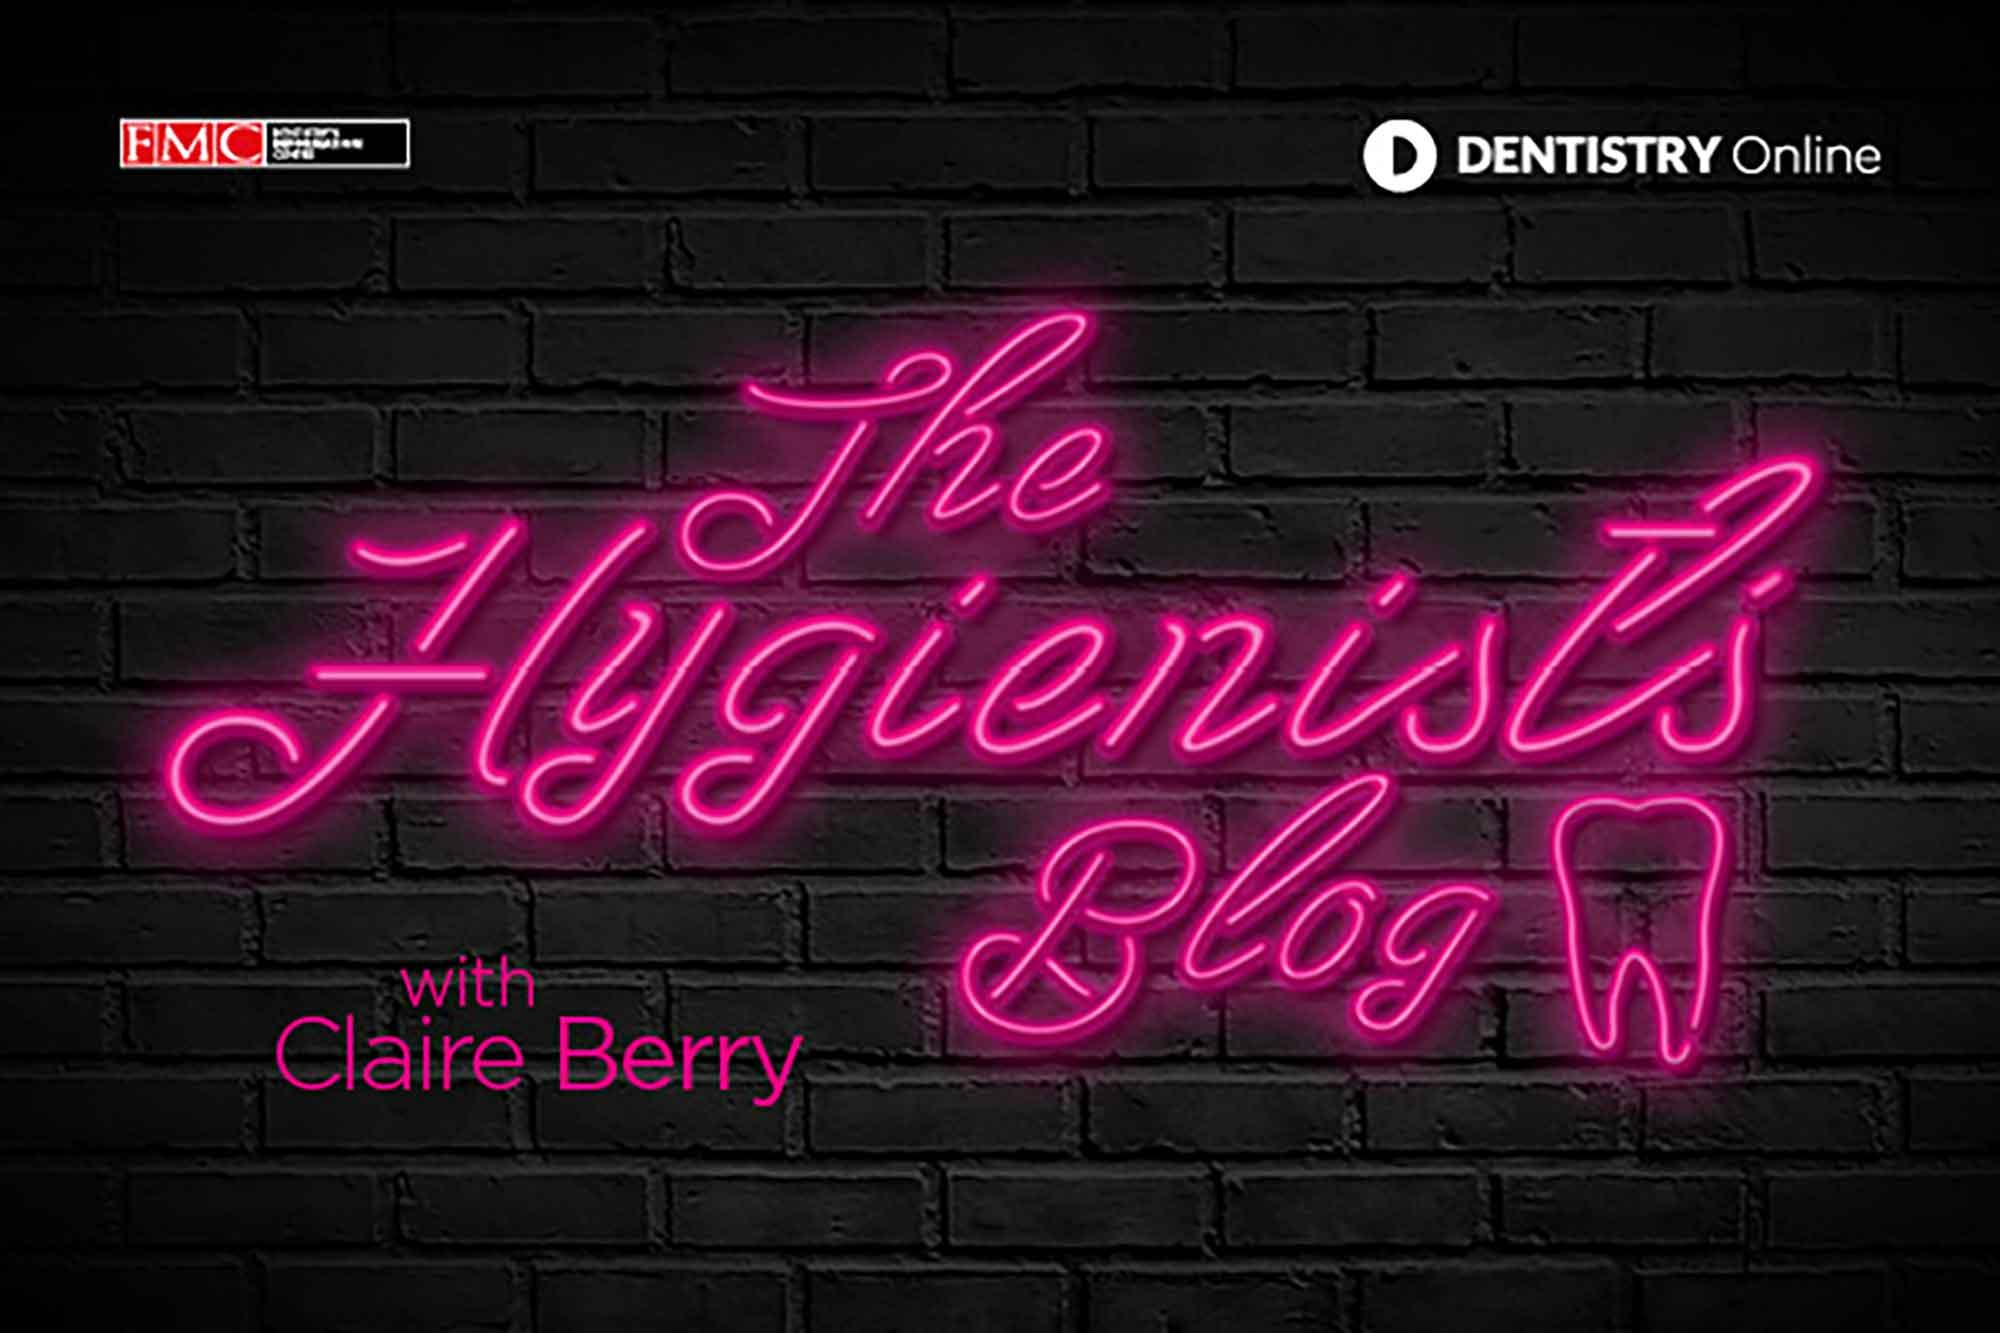 The Hygienist's Blog